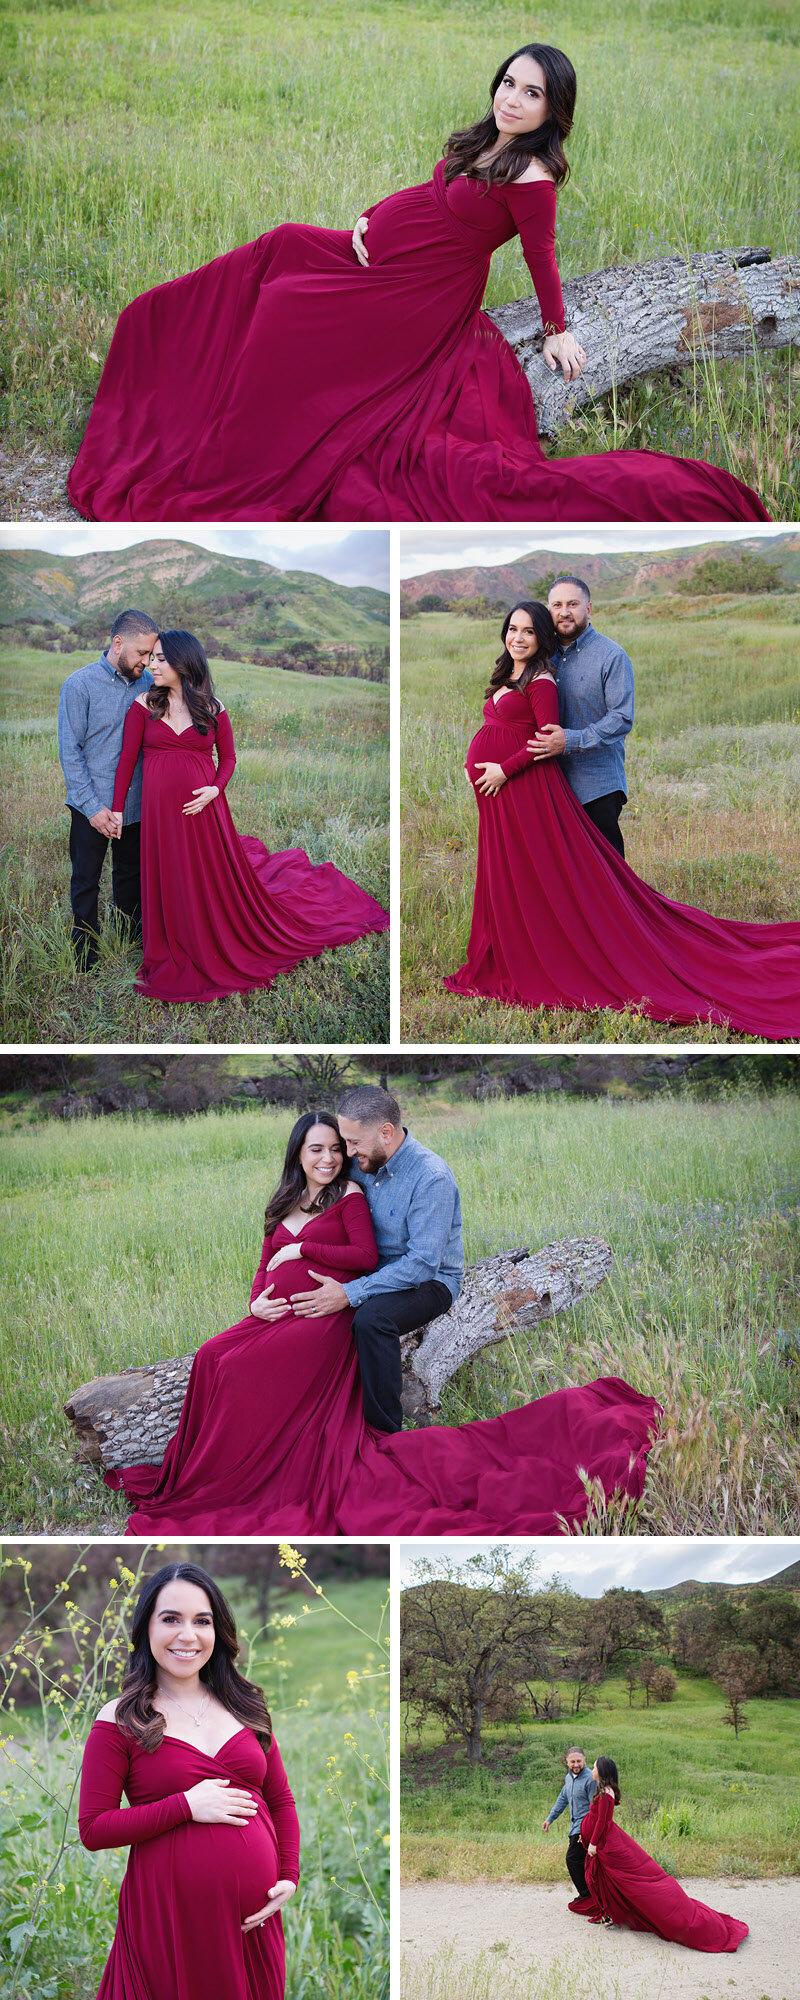 Thousand oaks professional maternity photographer